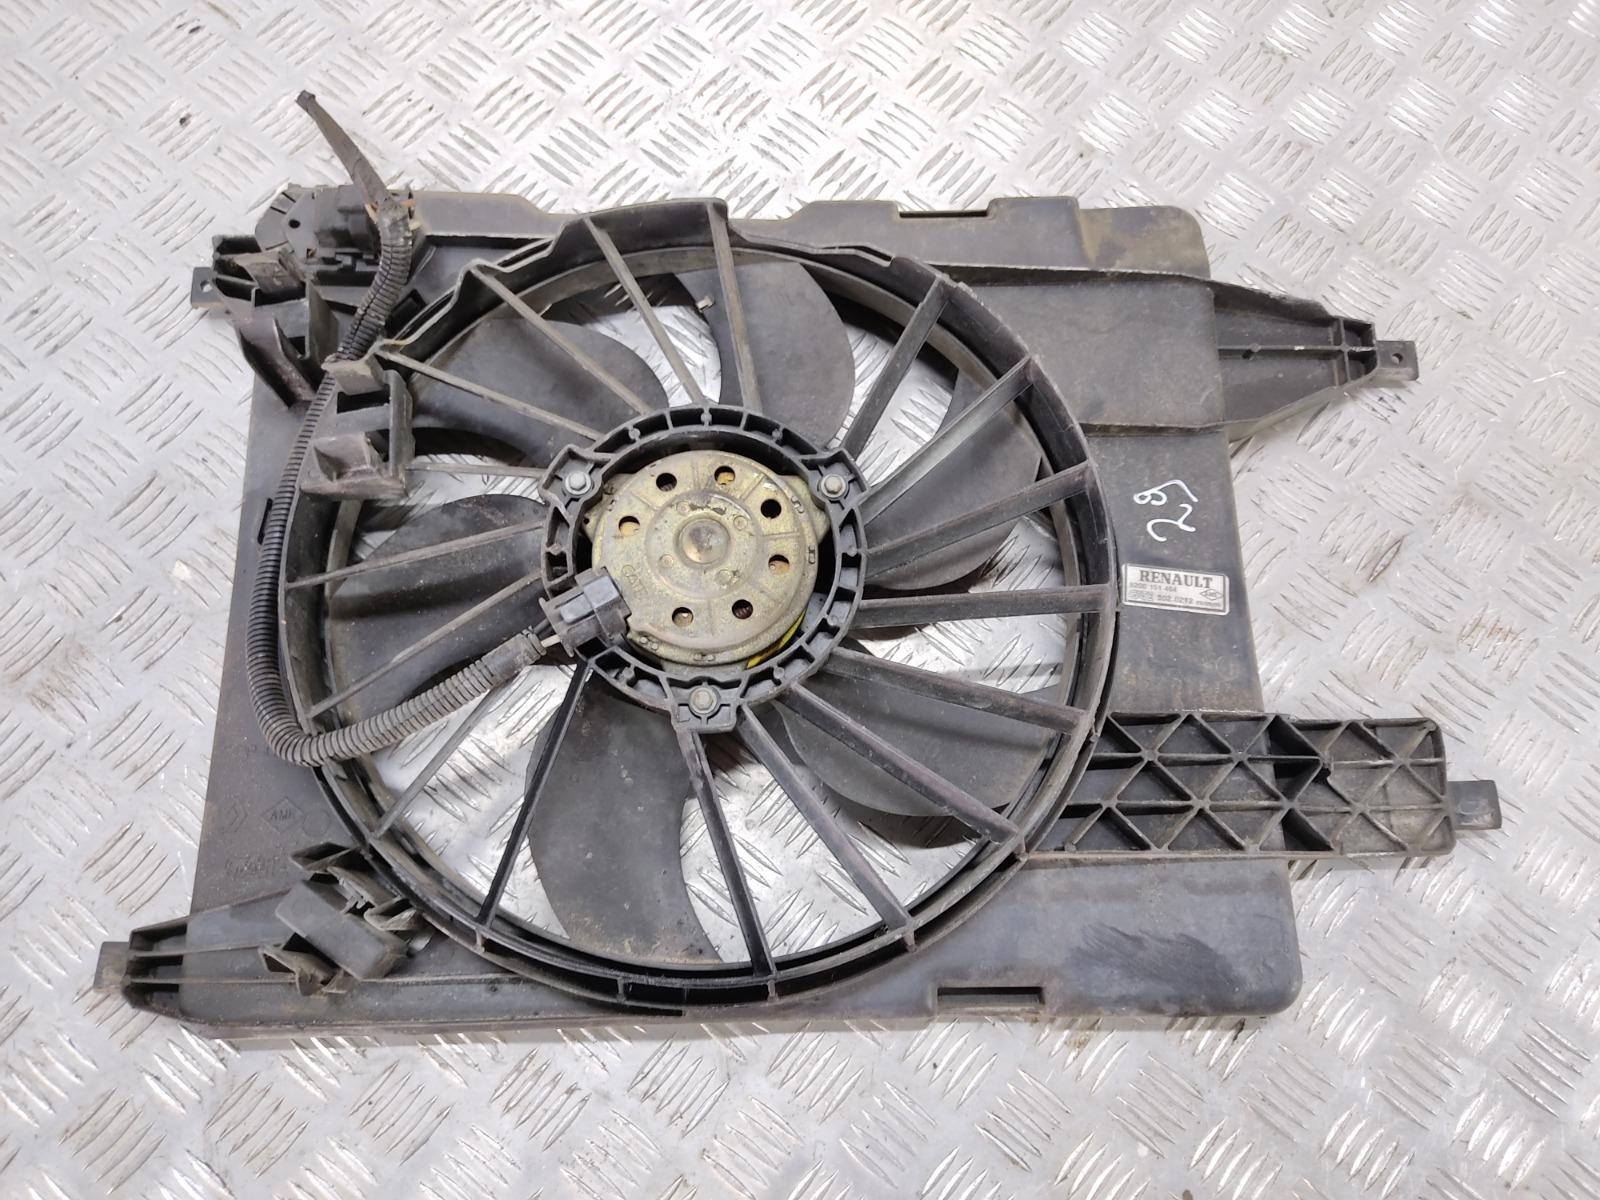 Вентилятор радиатора Renault Megane 1.6 I 2005 (б/у)